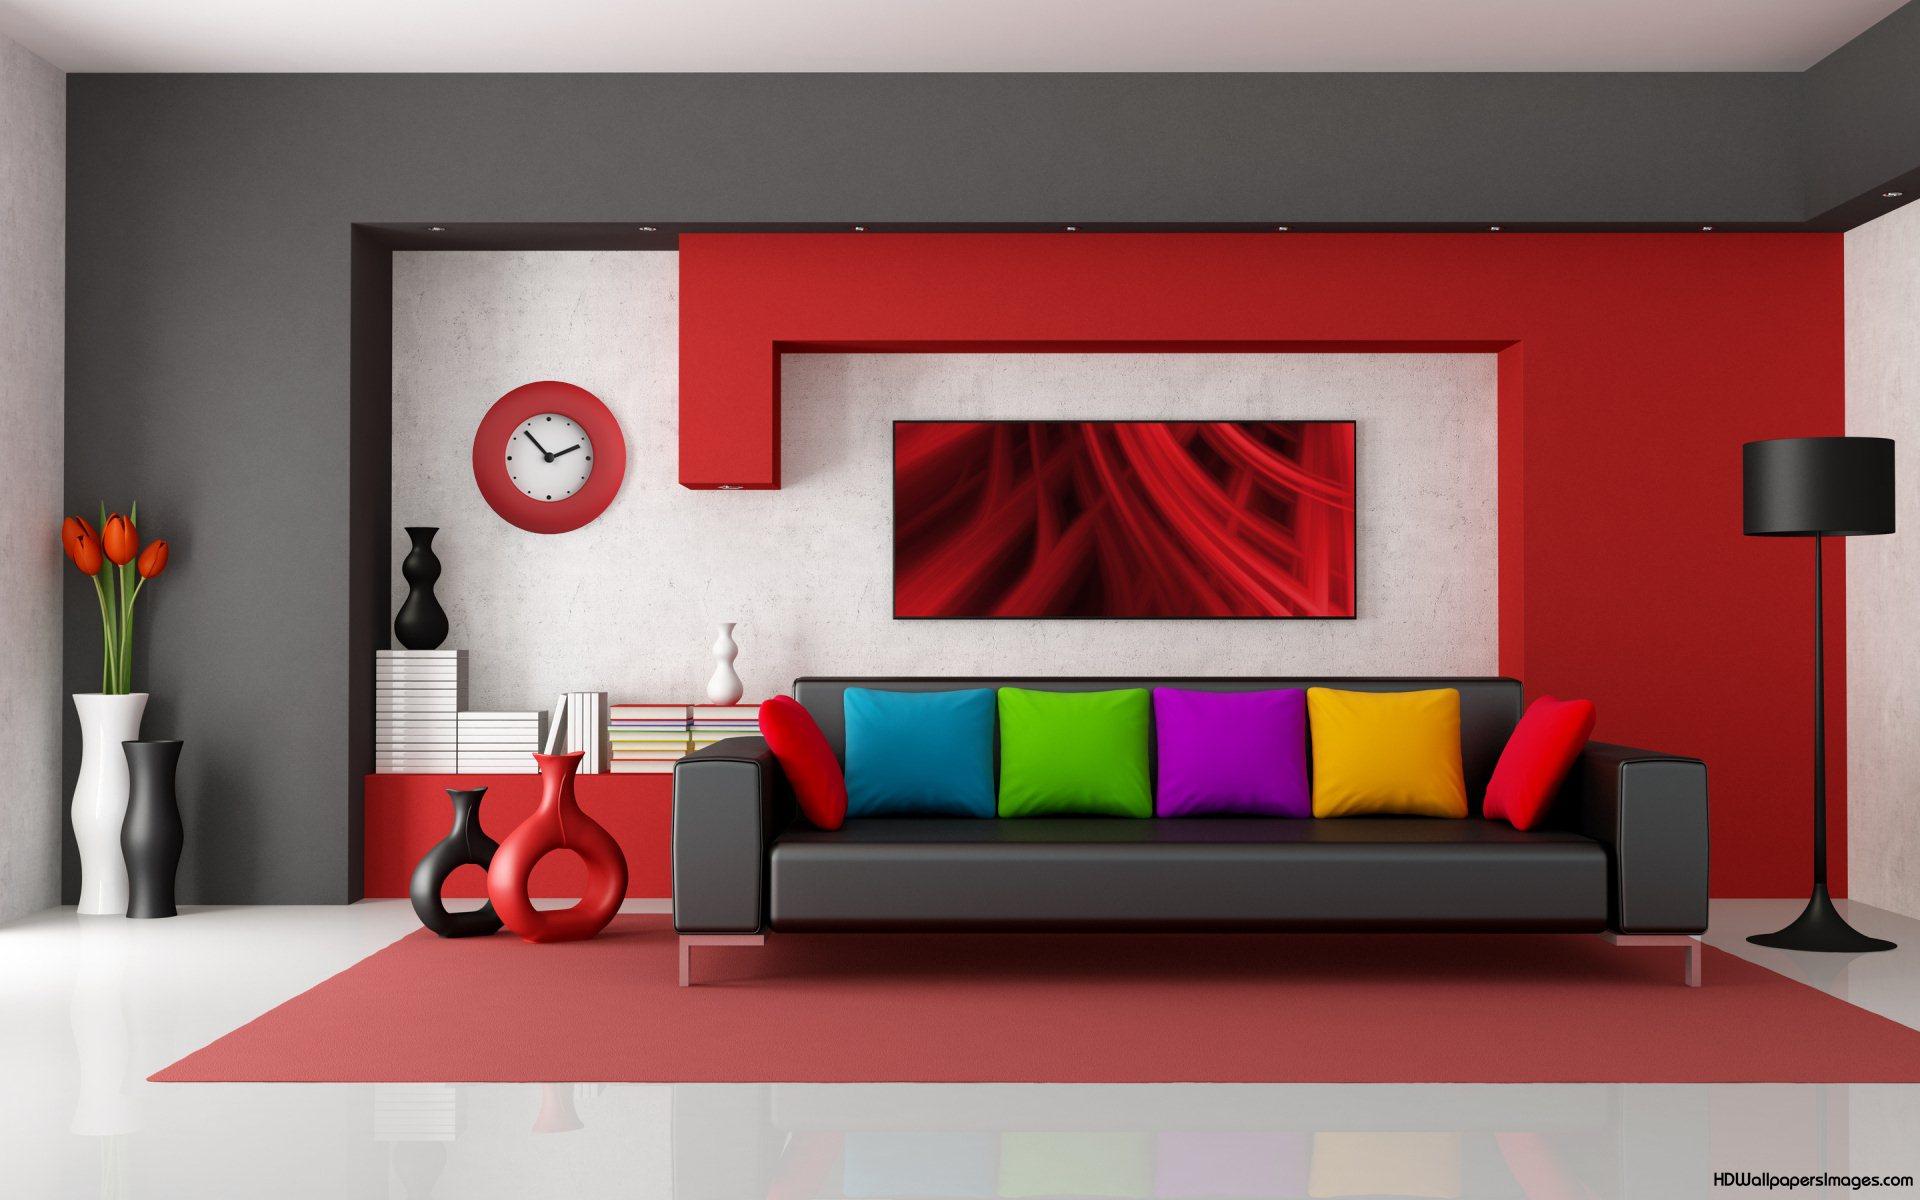 Interior design |  Osteen School OWYCJKP